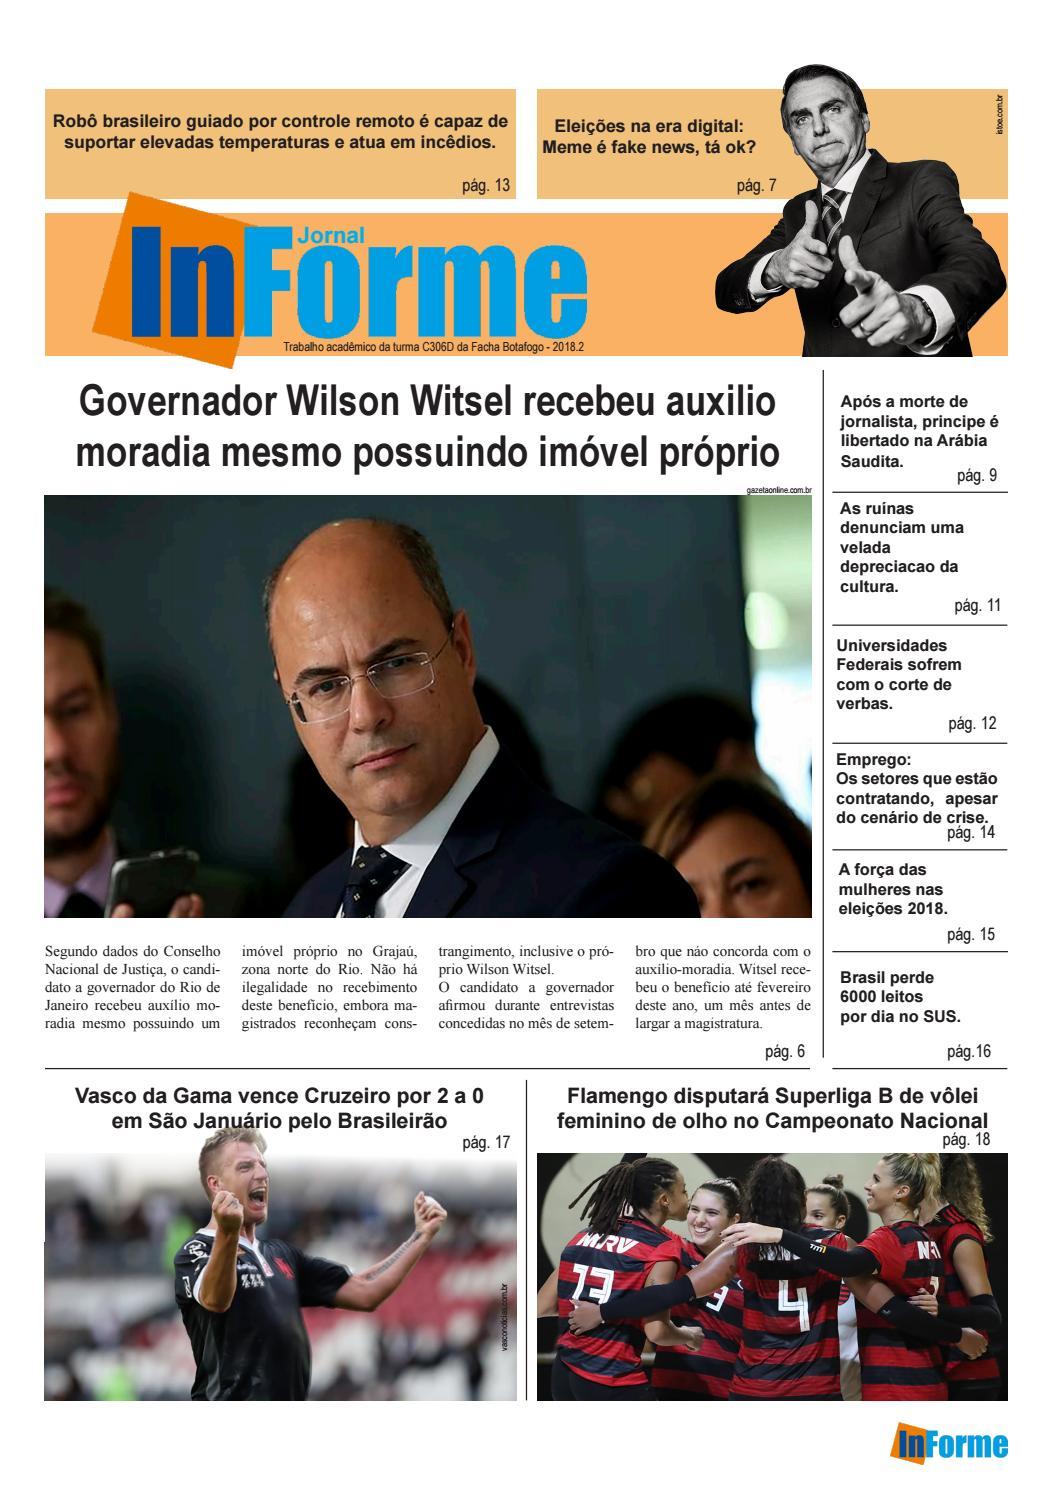 eefed05bac Jornal InForme C306D Facha 2018 2 by Gilvan Nascimento - issuu